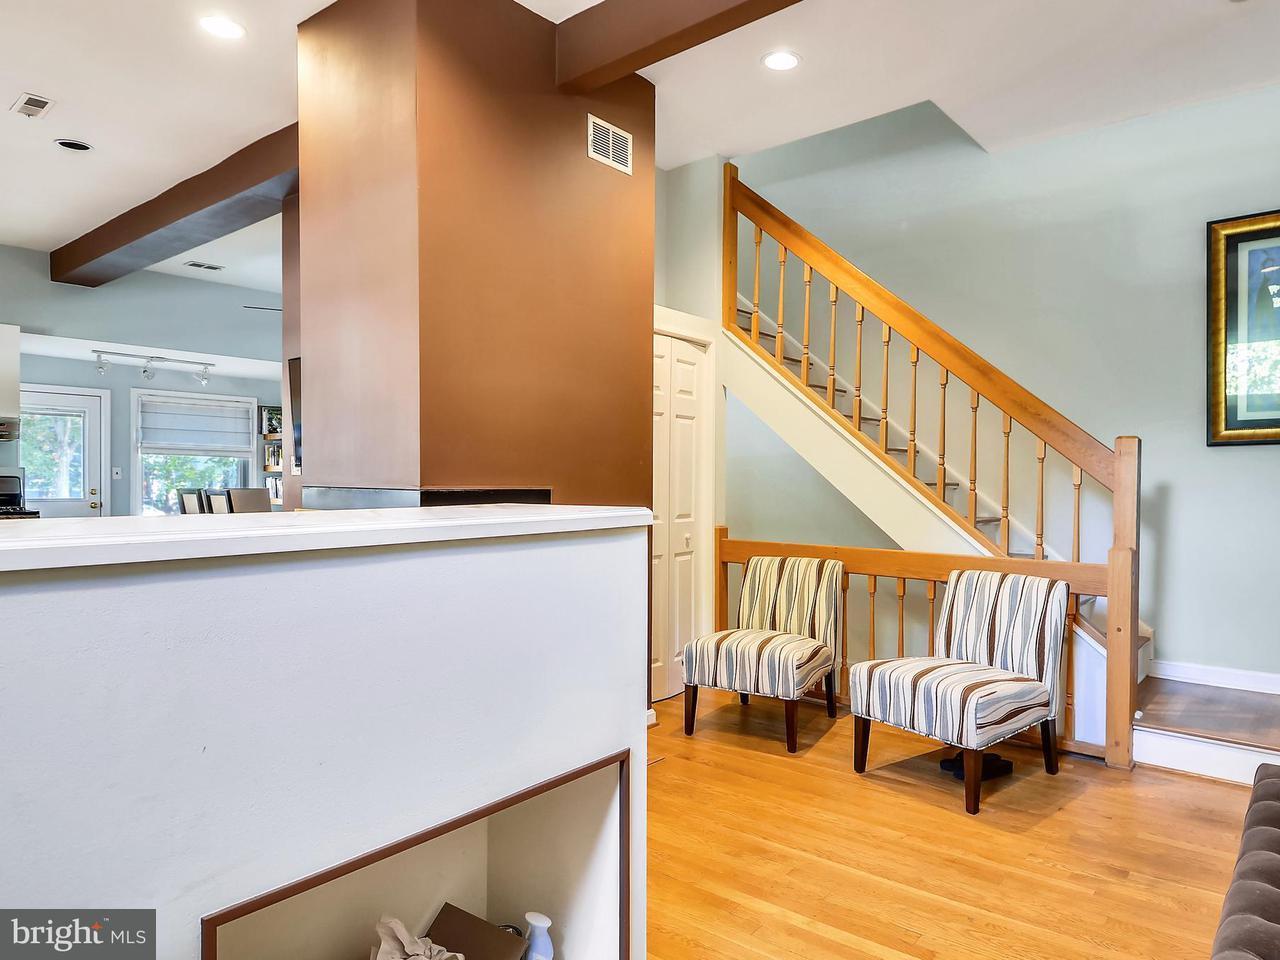 Additional photo for property listing at 1201 F St Ne 1201 F St Ne Washington, District De Columbia 20002 États-Unis